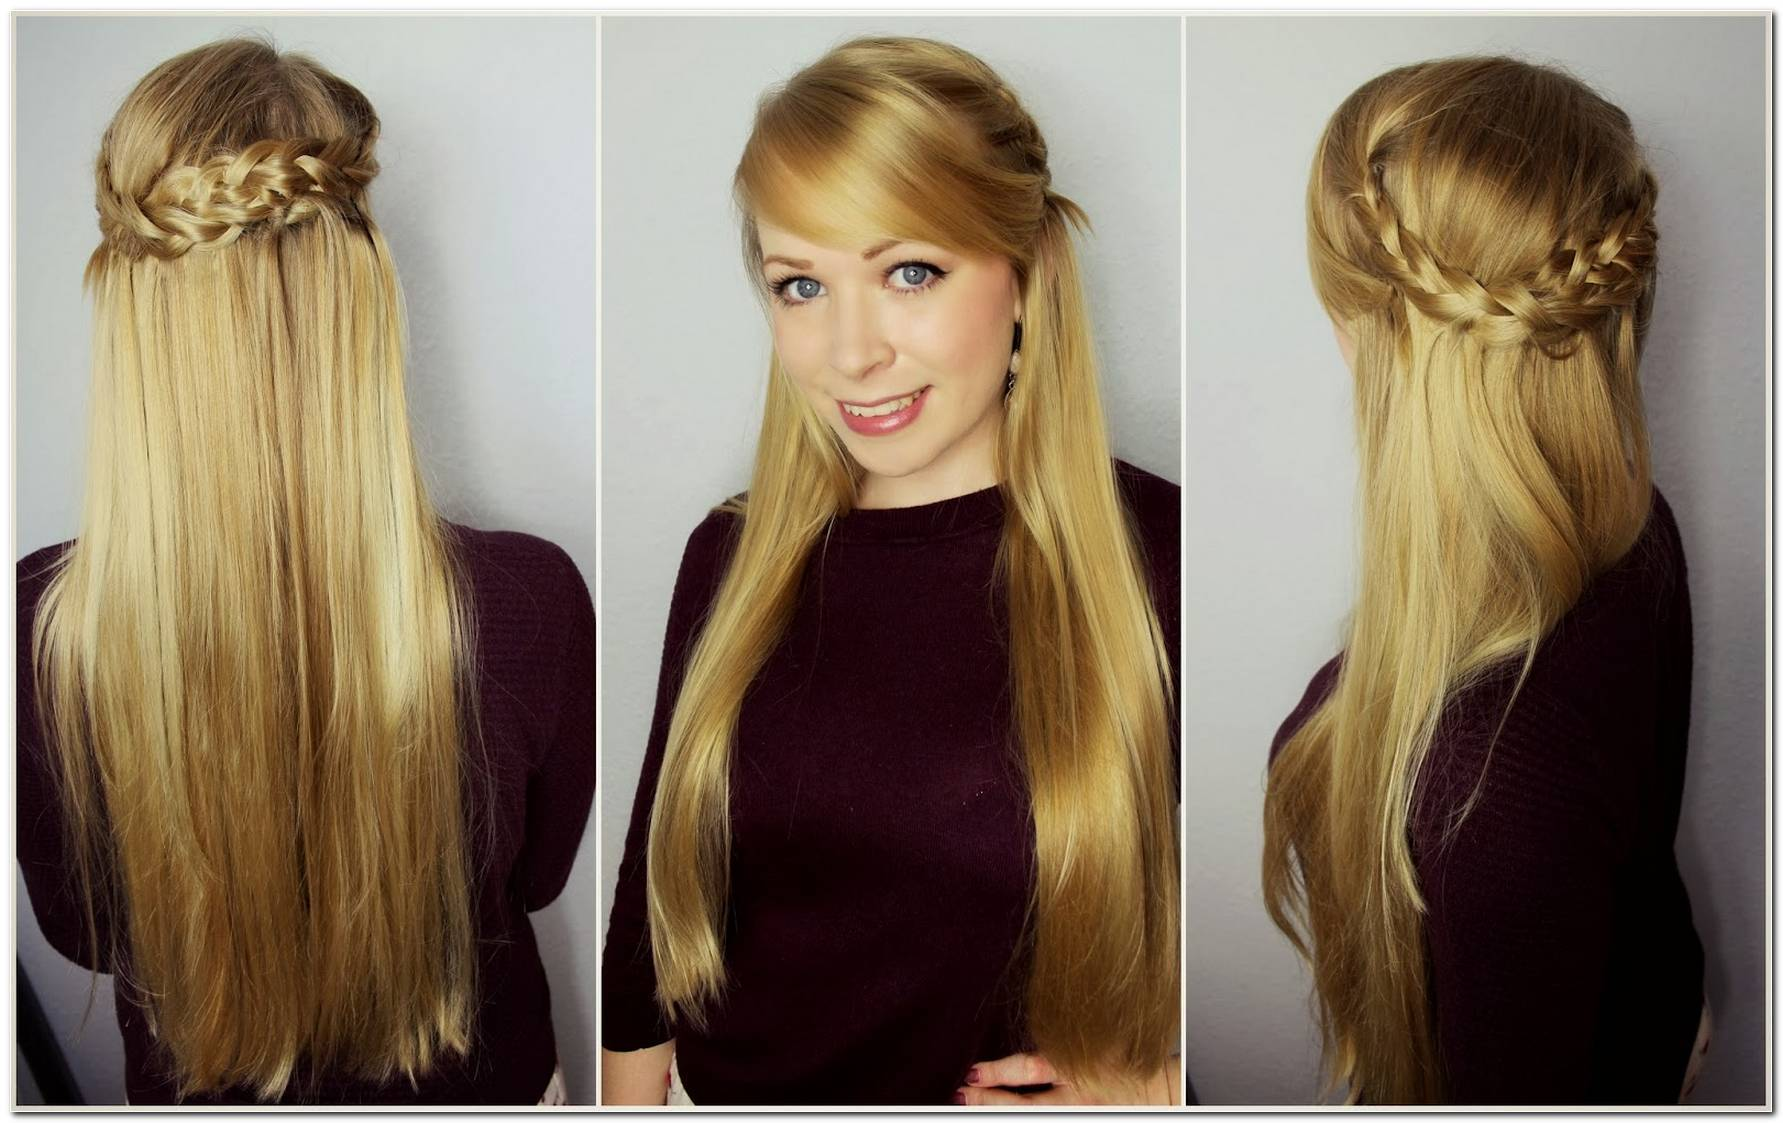 Festliche Frisuren F%C3%BCR D%C3%BCNnes Langes Haar